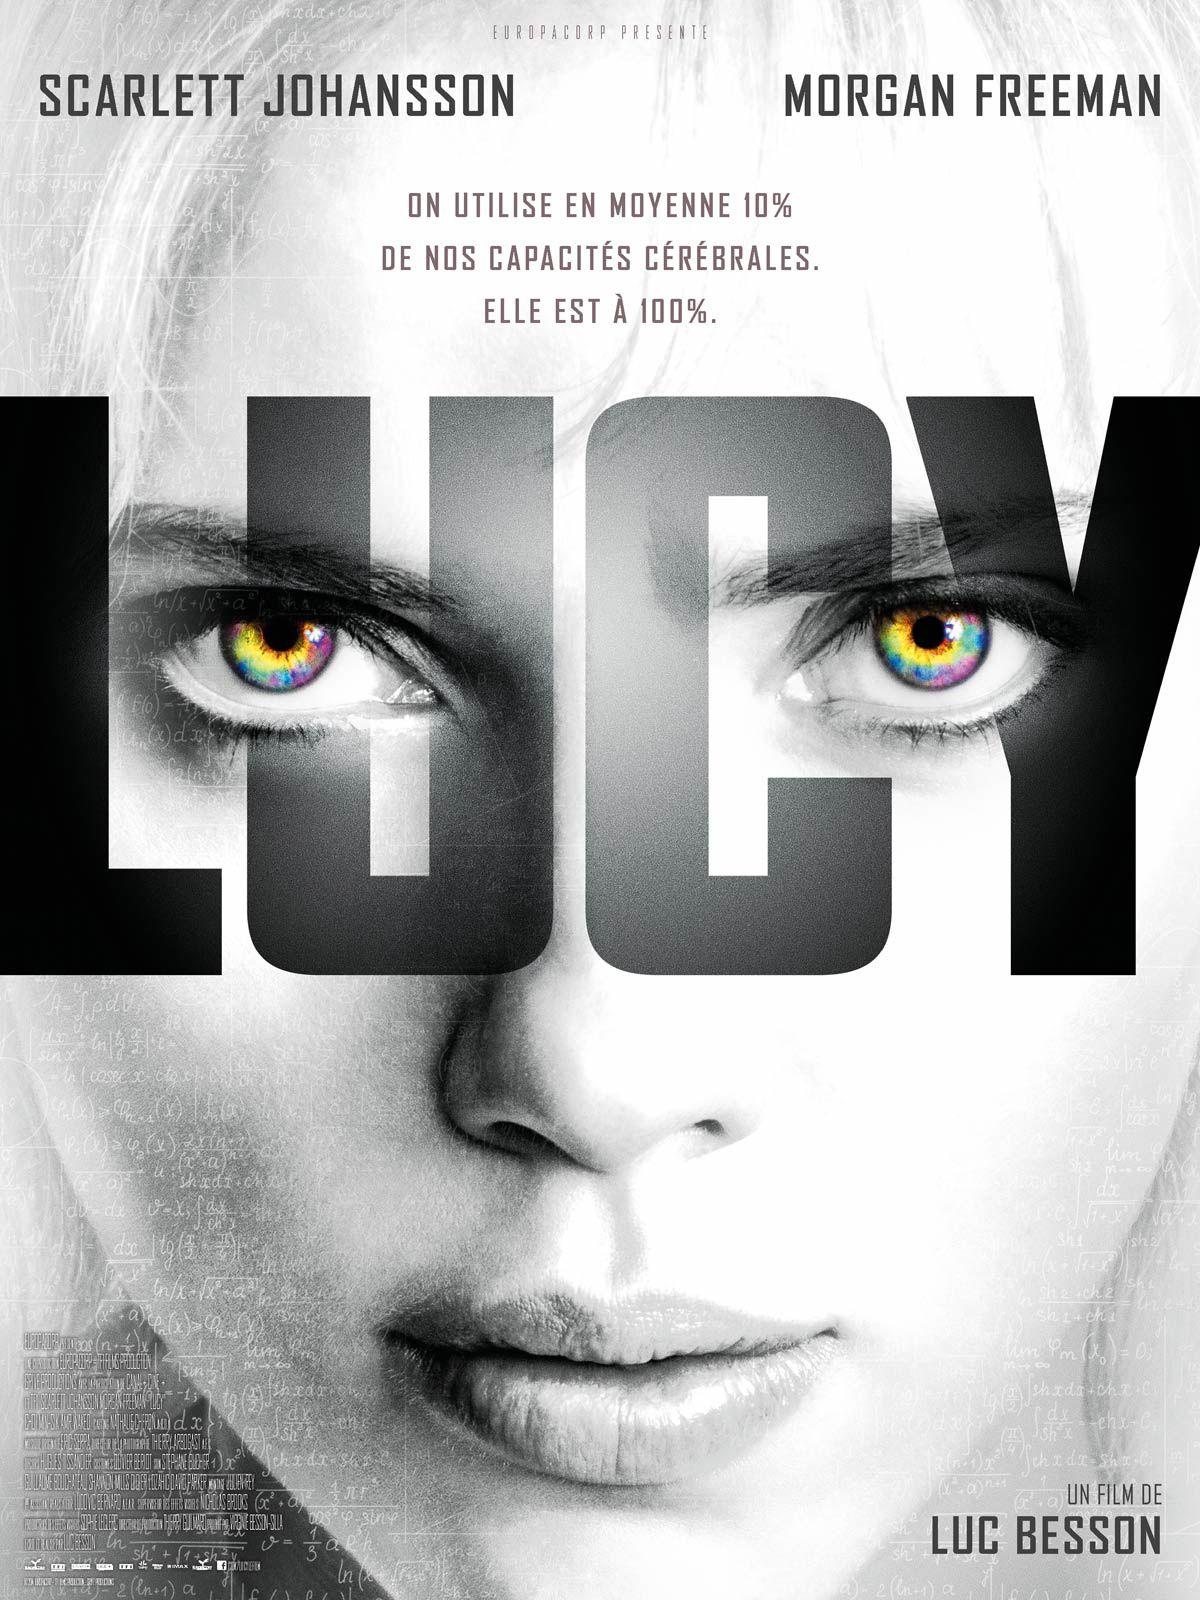 LUCY (MAKING-OF : Lieux de tournage) de Luc Besson avec Scarlett Johansson, Morgan Freeman - 06 08 2014